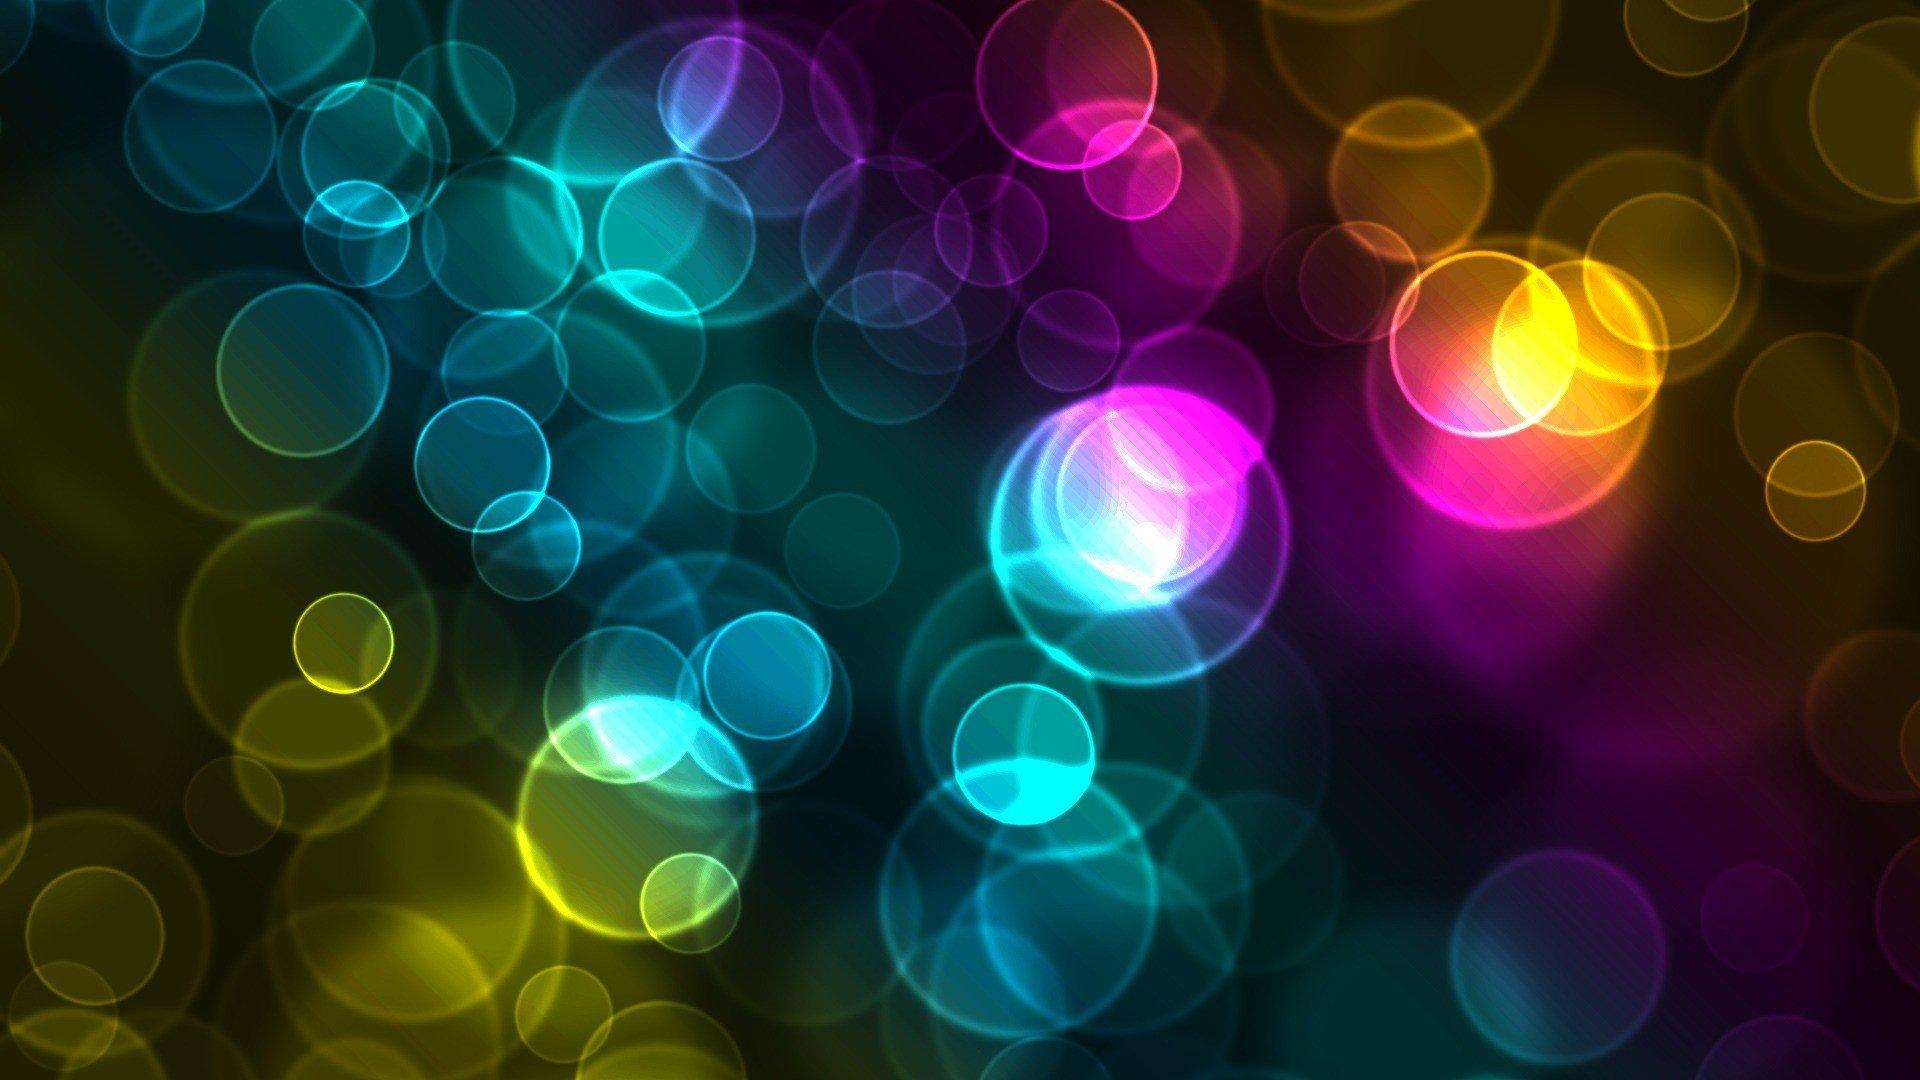 Fondo Colores psicodelico